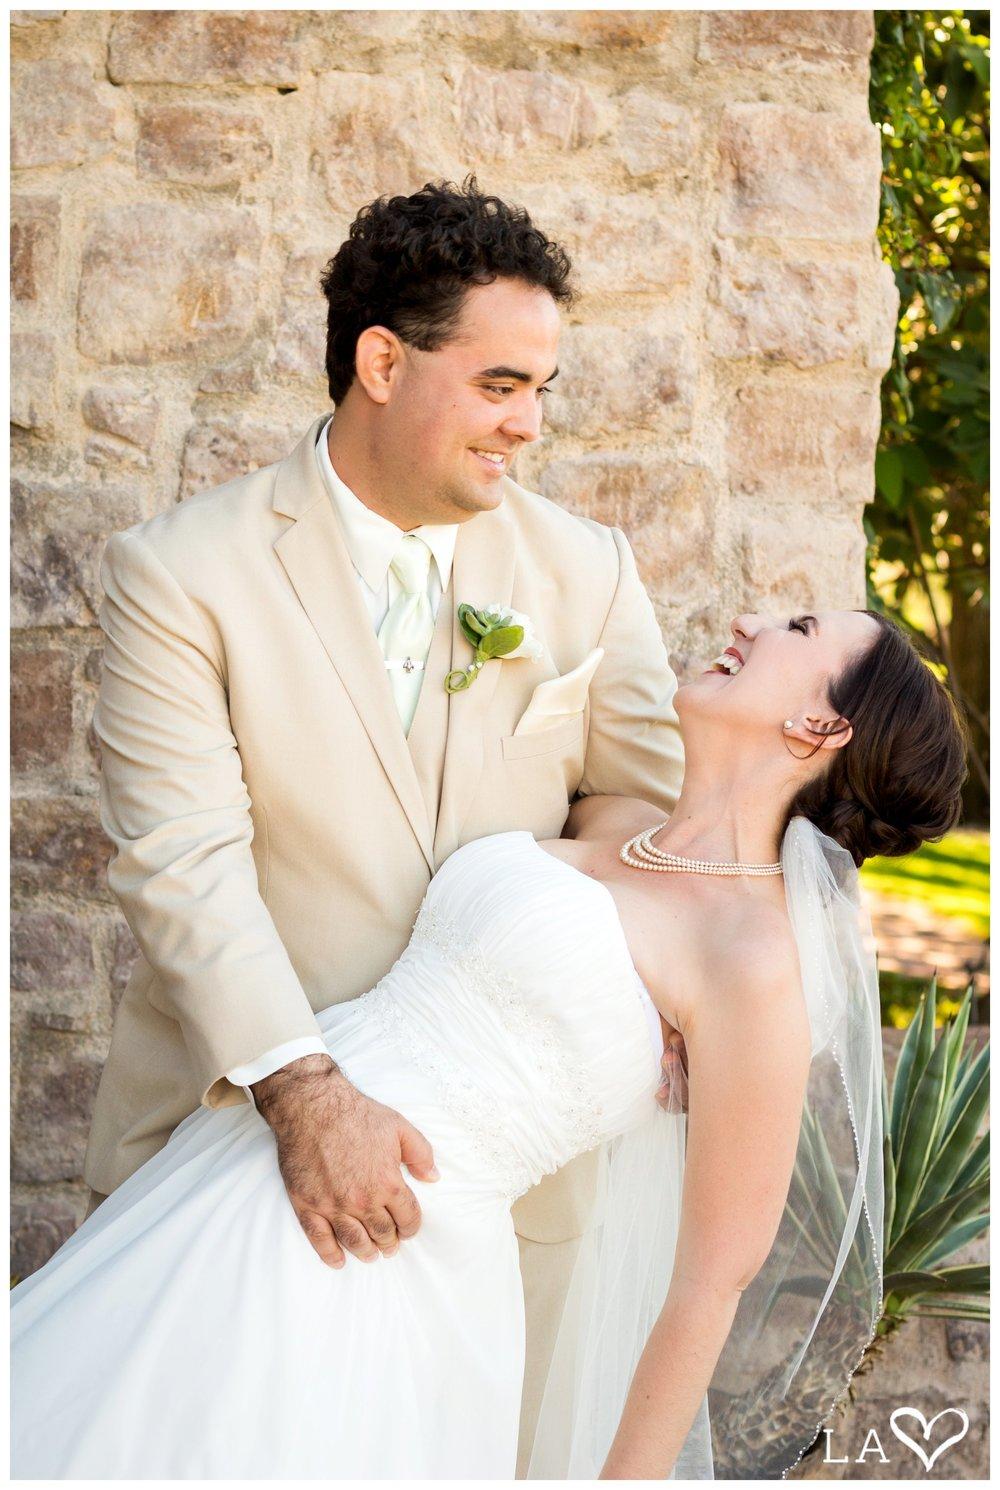 Superstition Mountain Wedding - Sarah & Patrick-4.jpg